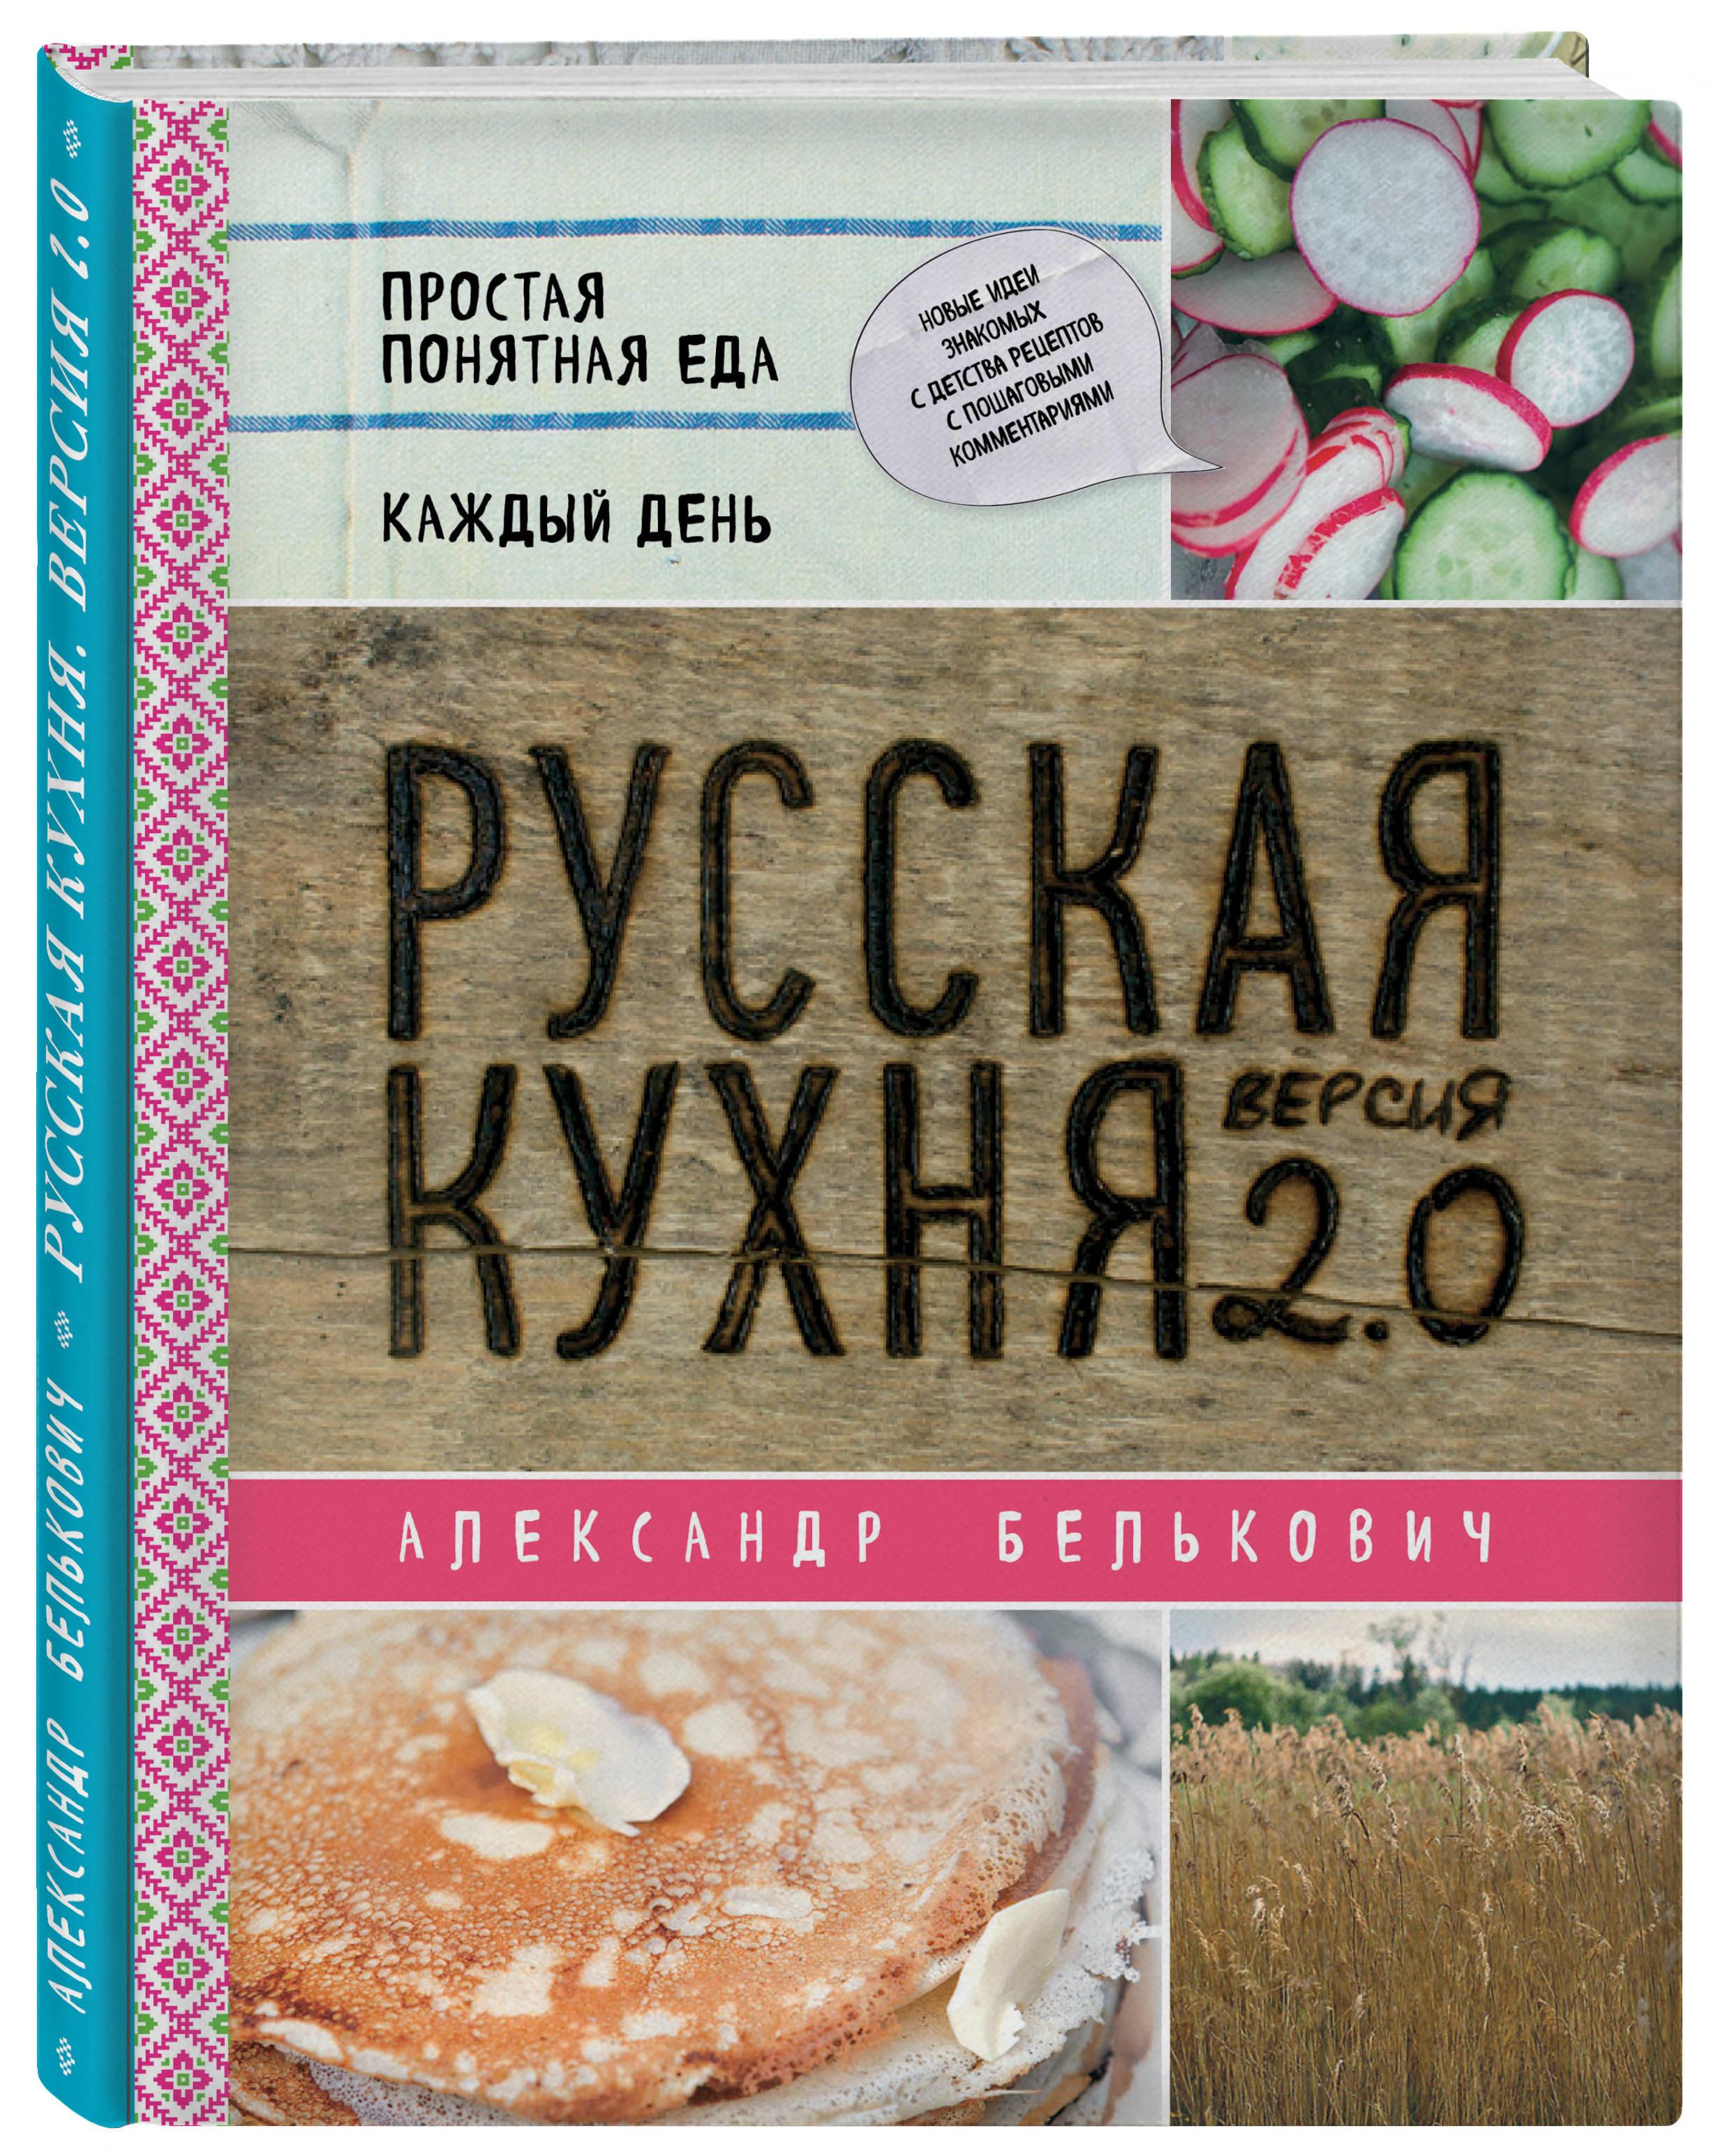 Александр Белькович Русская кухня. Версия 2.0 (2-е издание)